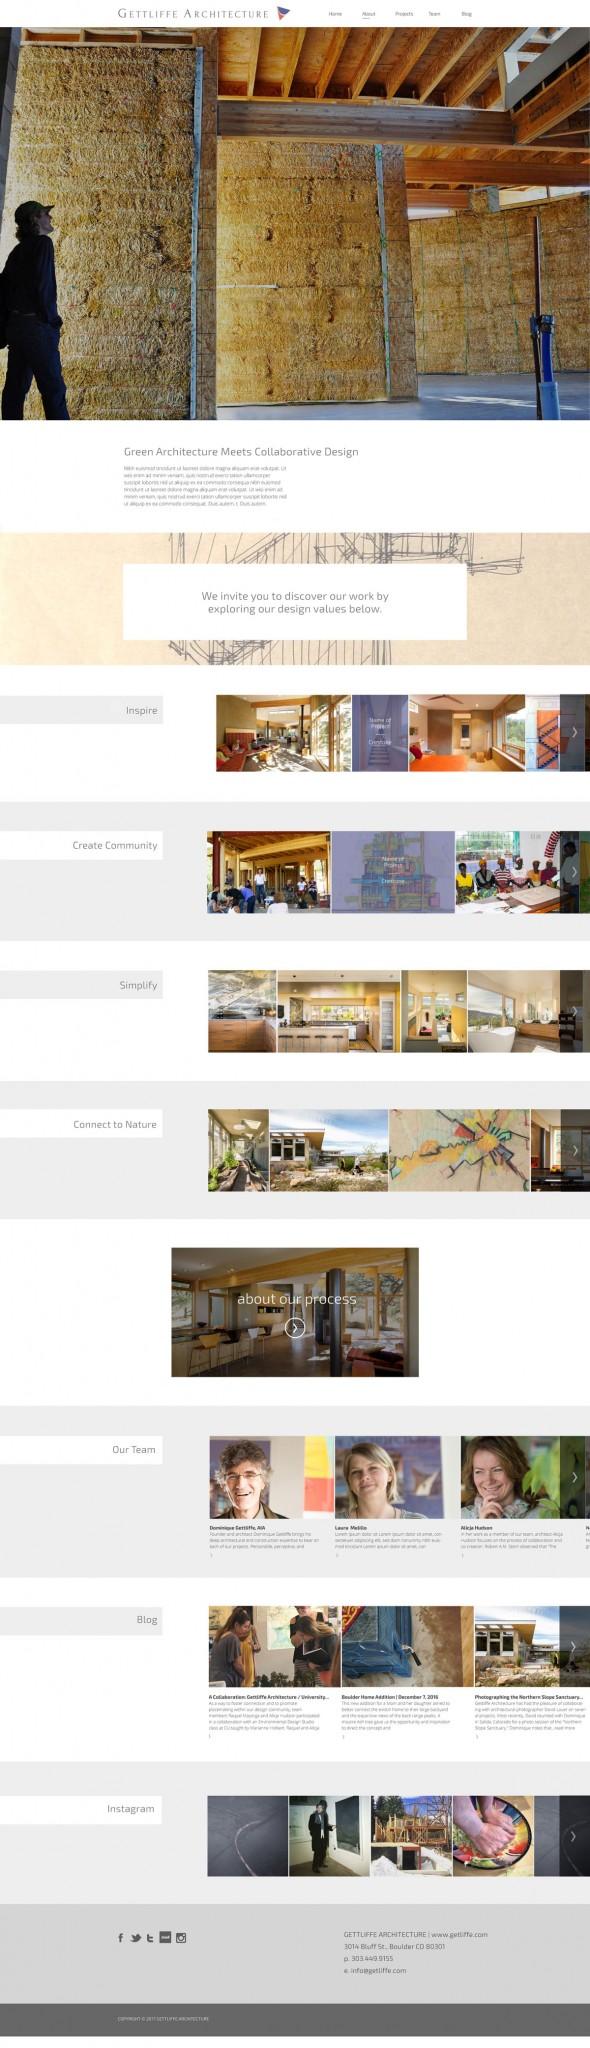 website-design-gettliffe-mockup-homepage